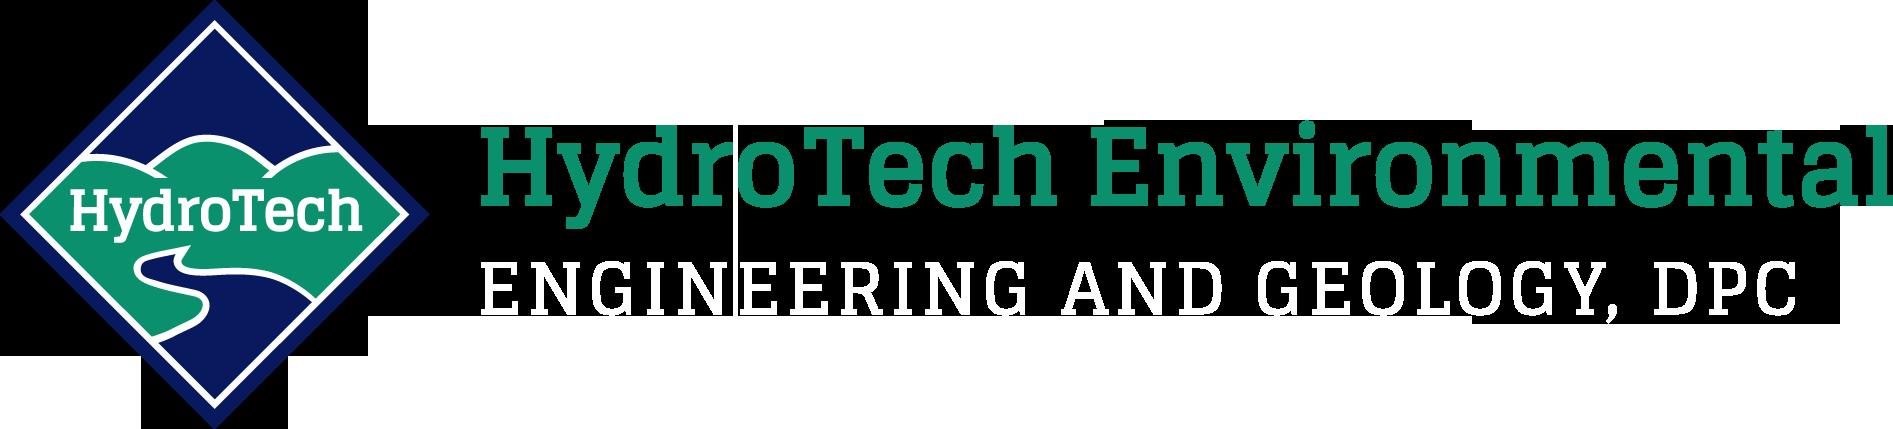 hydrotech-logo-border-white-text.png